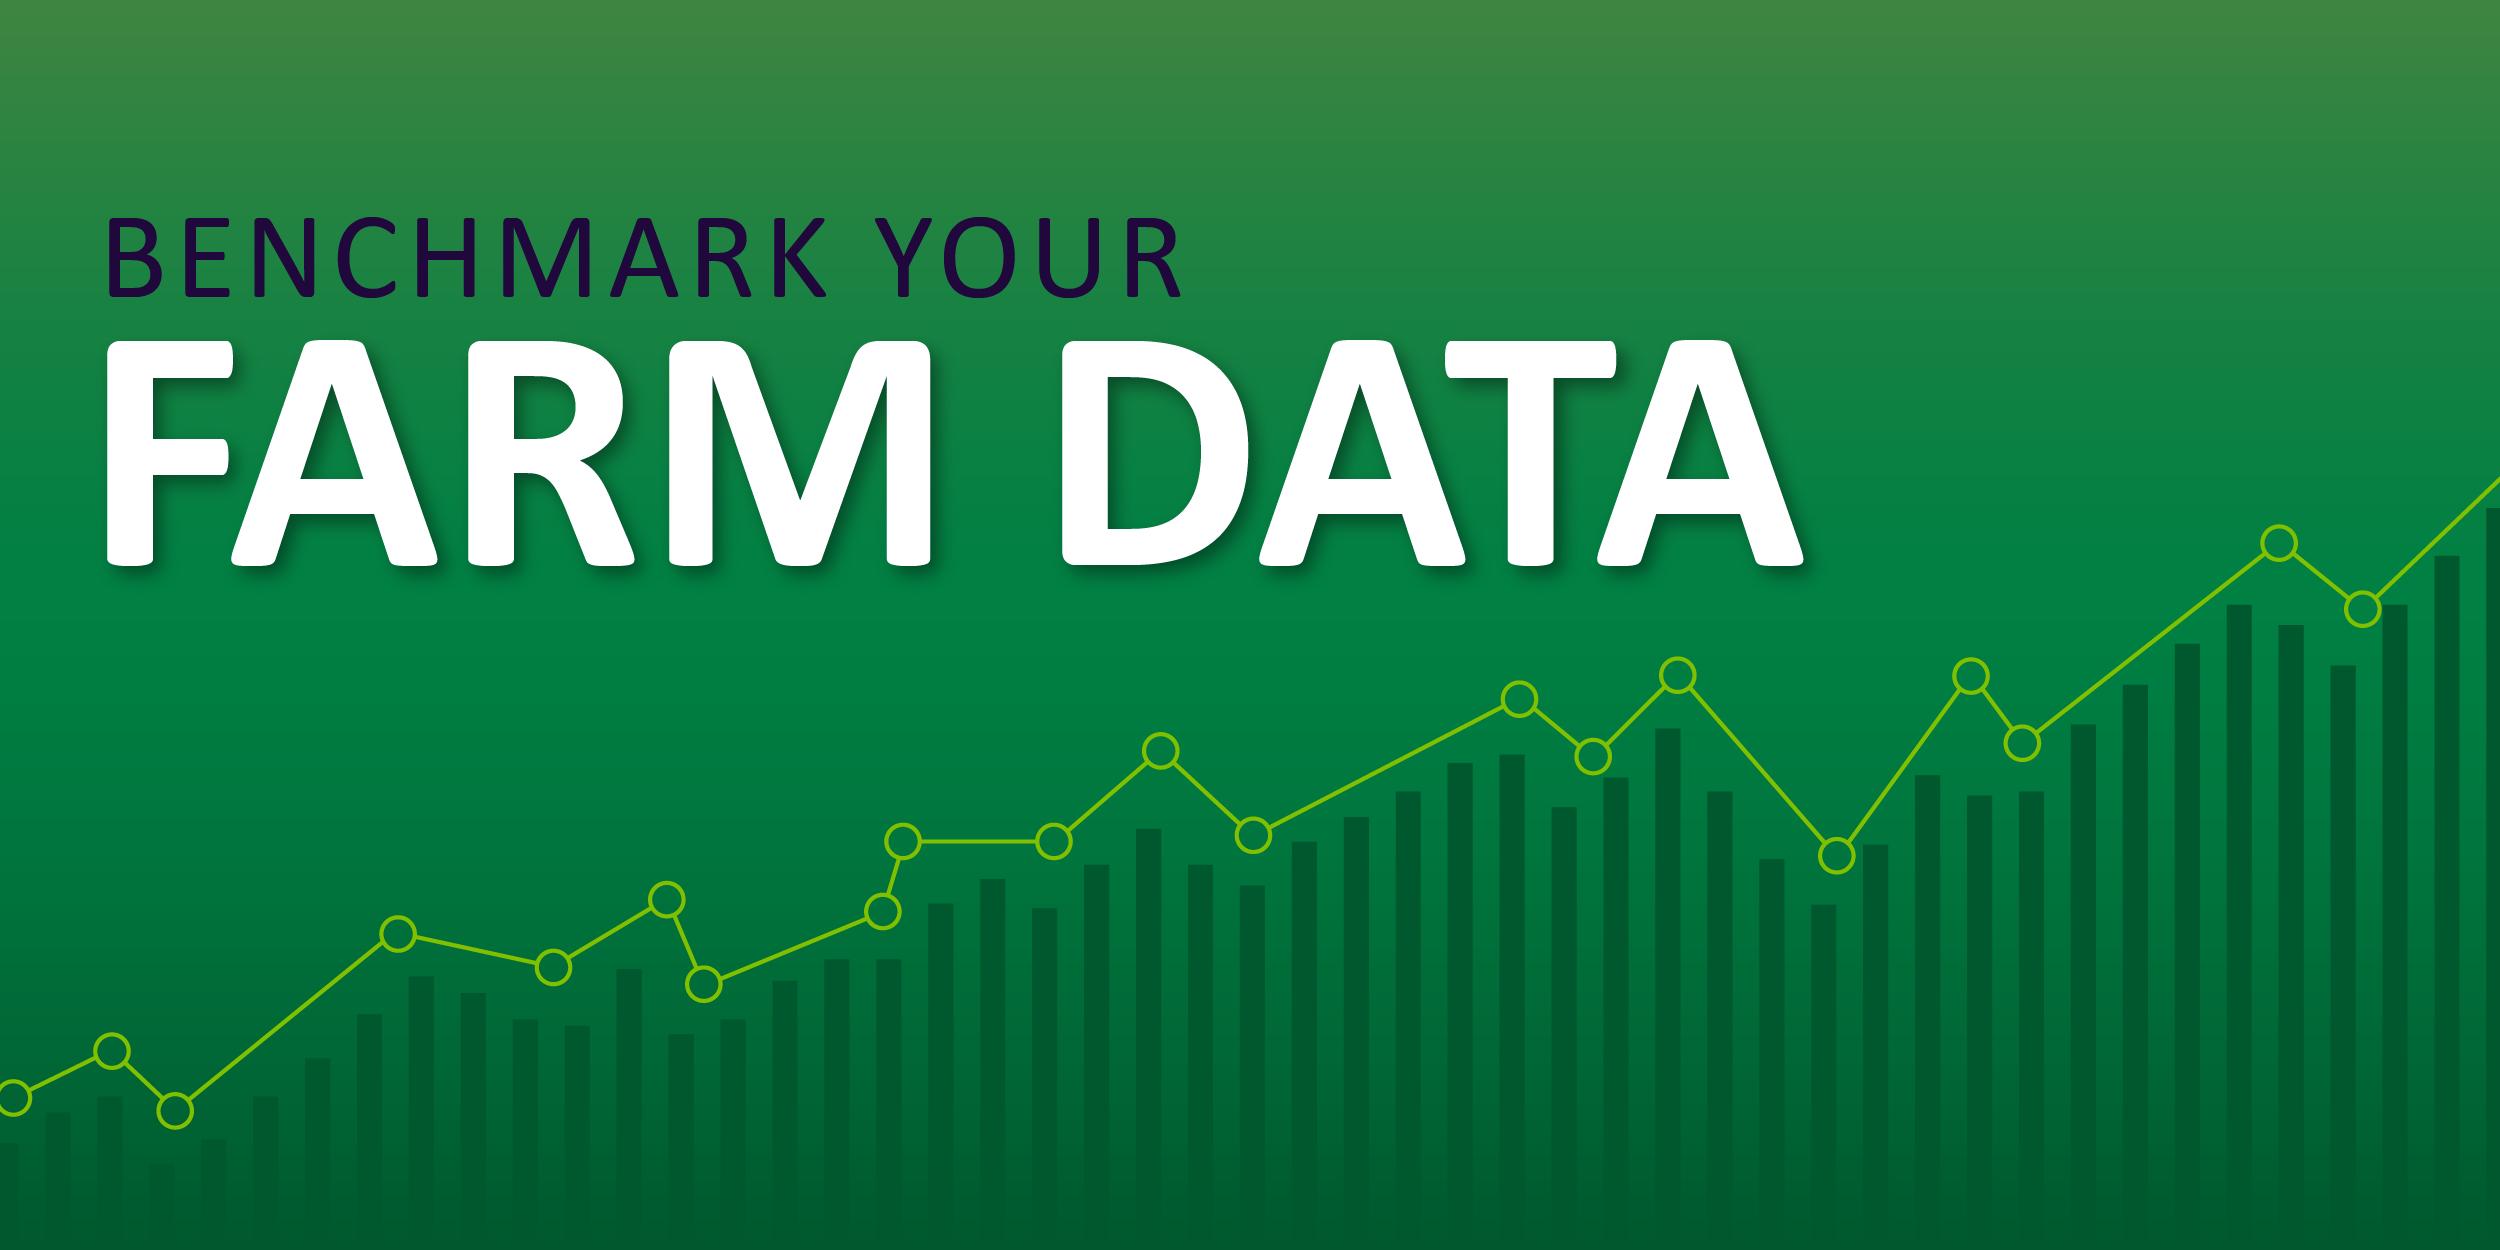 Benchmark your Farm Data